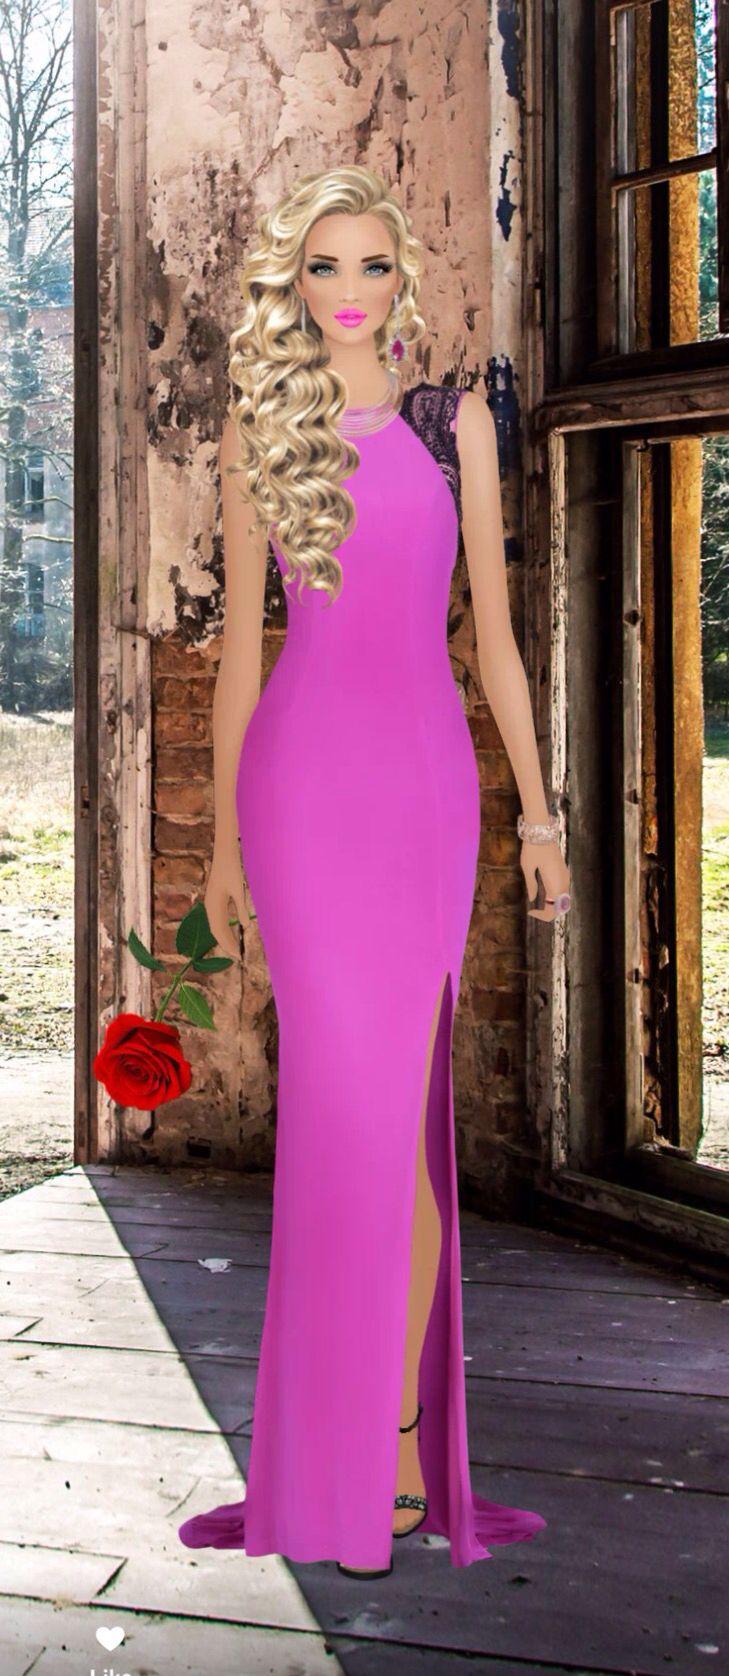 Rose Ceremony | طراحی لباس | Pinterest